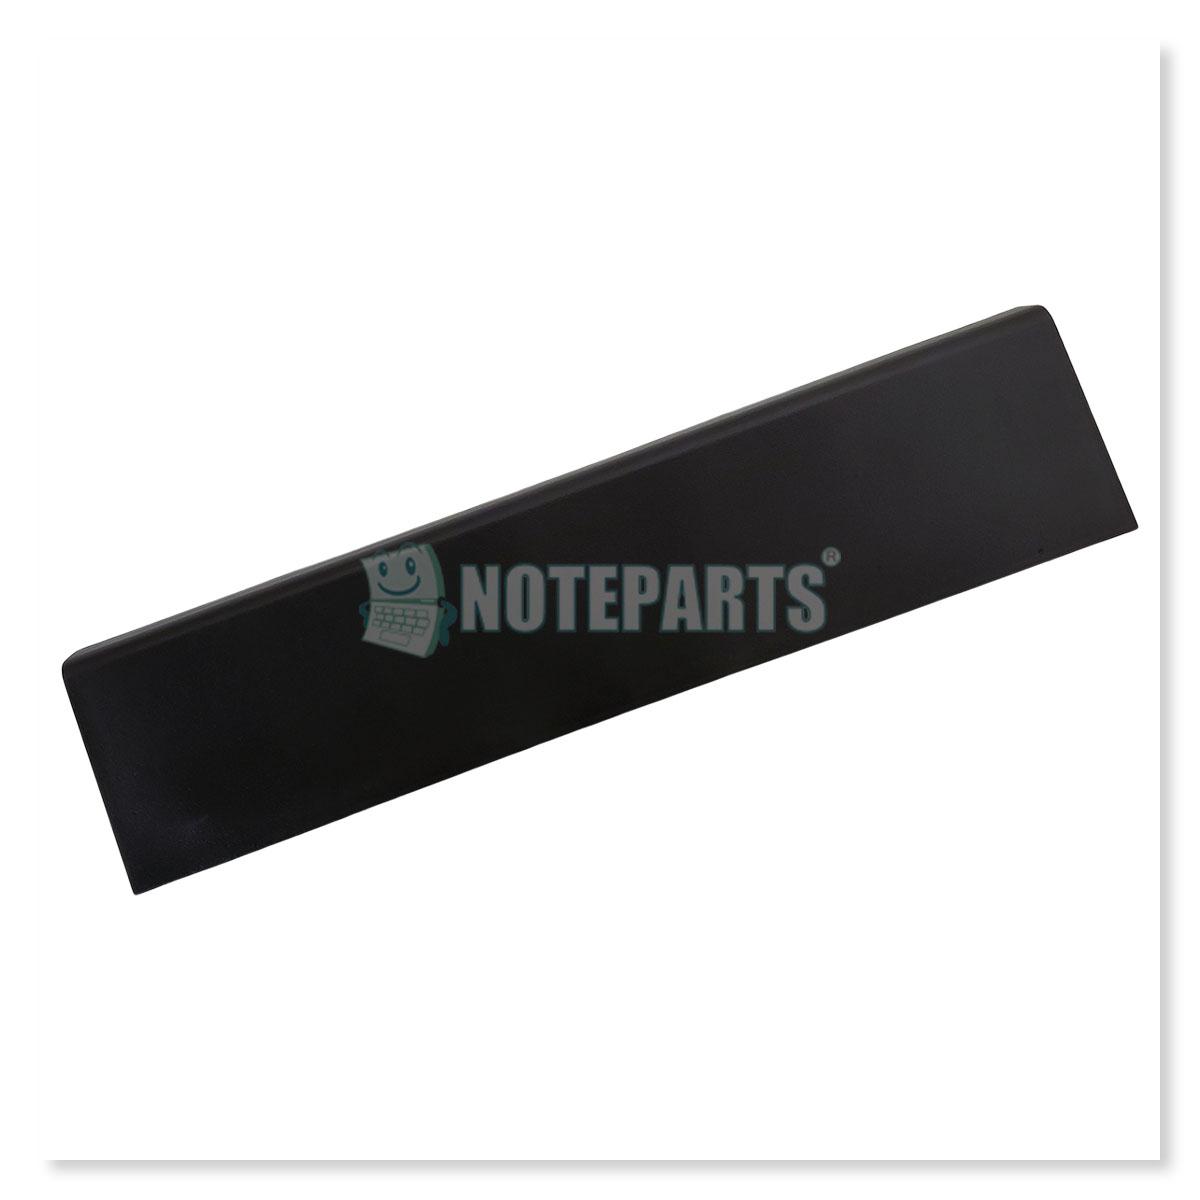 HP ProBook 4230s 6セル バッテリー JN06 QK651AA 633803-001対応